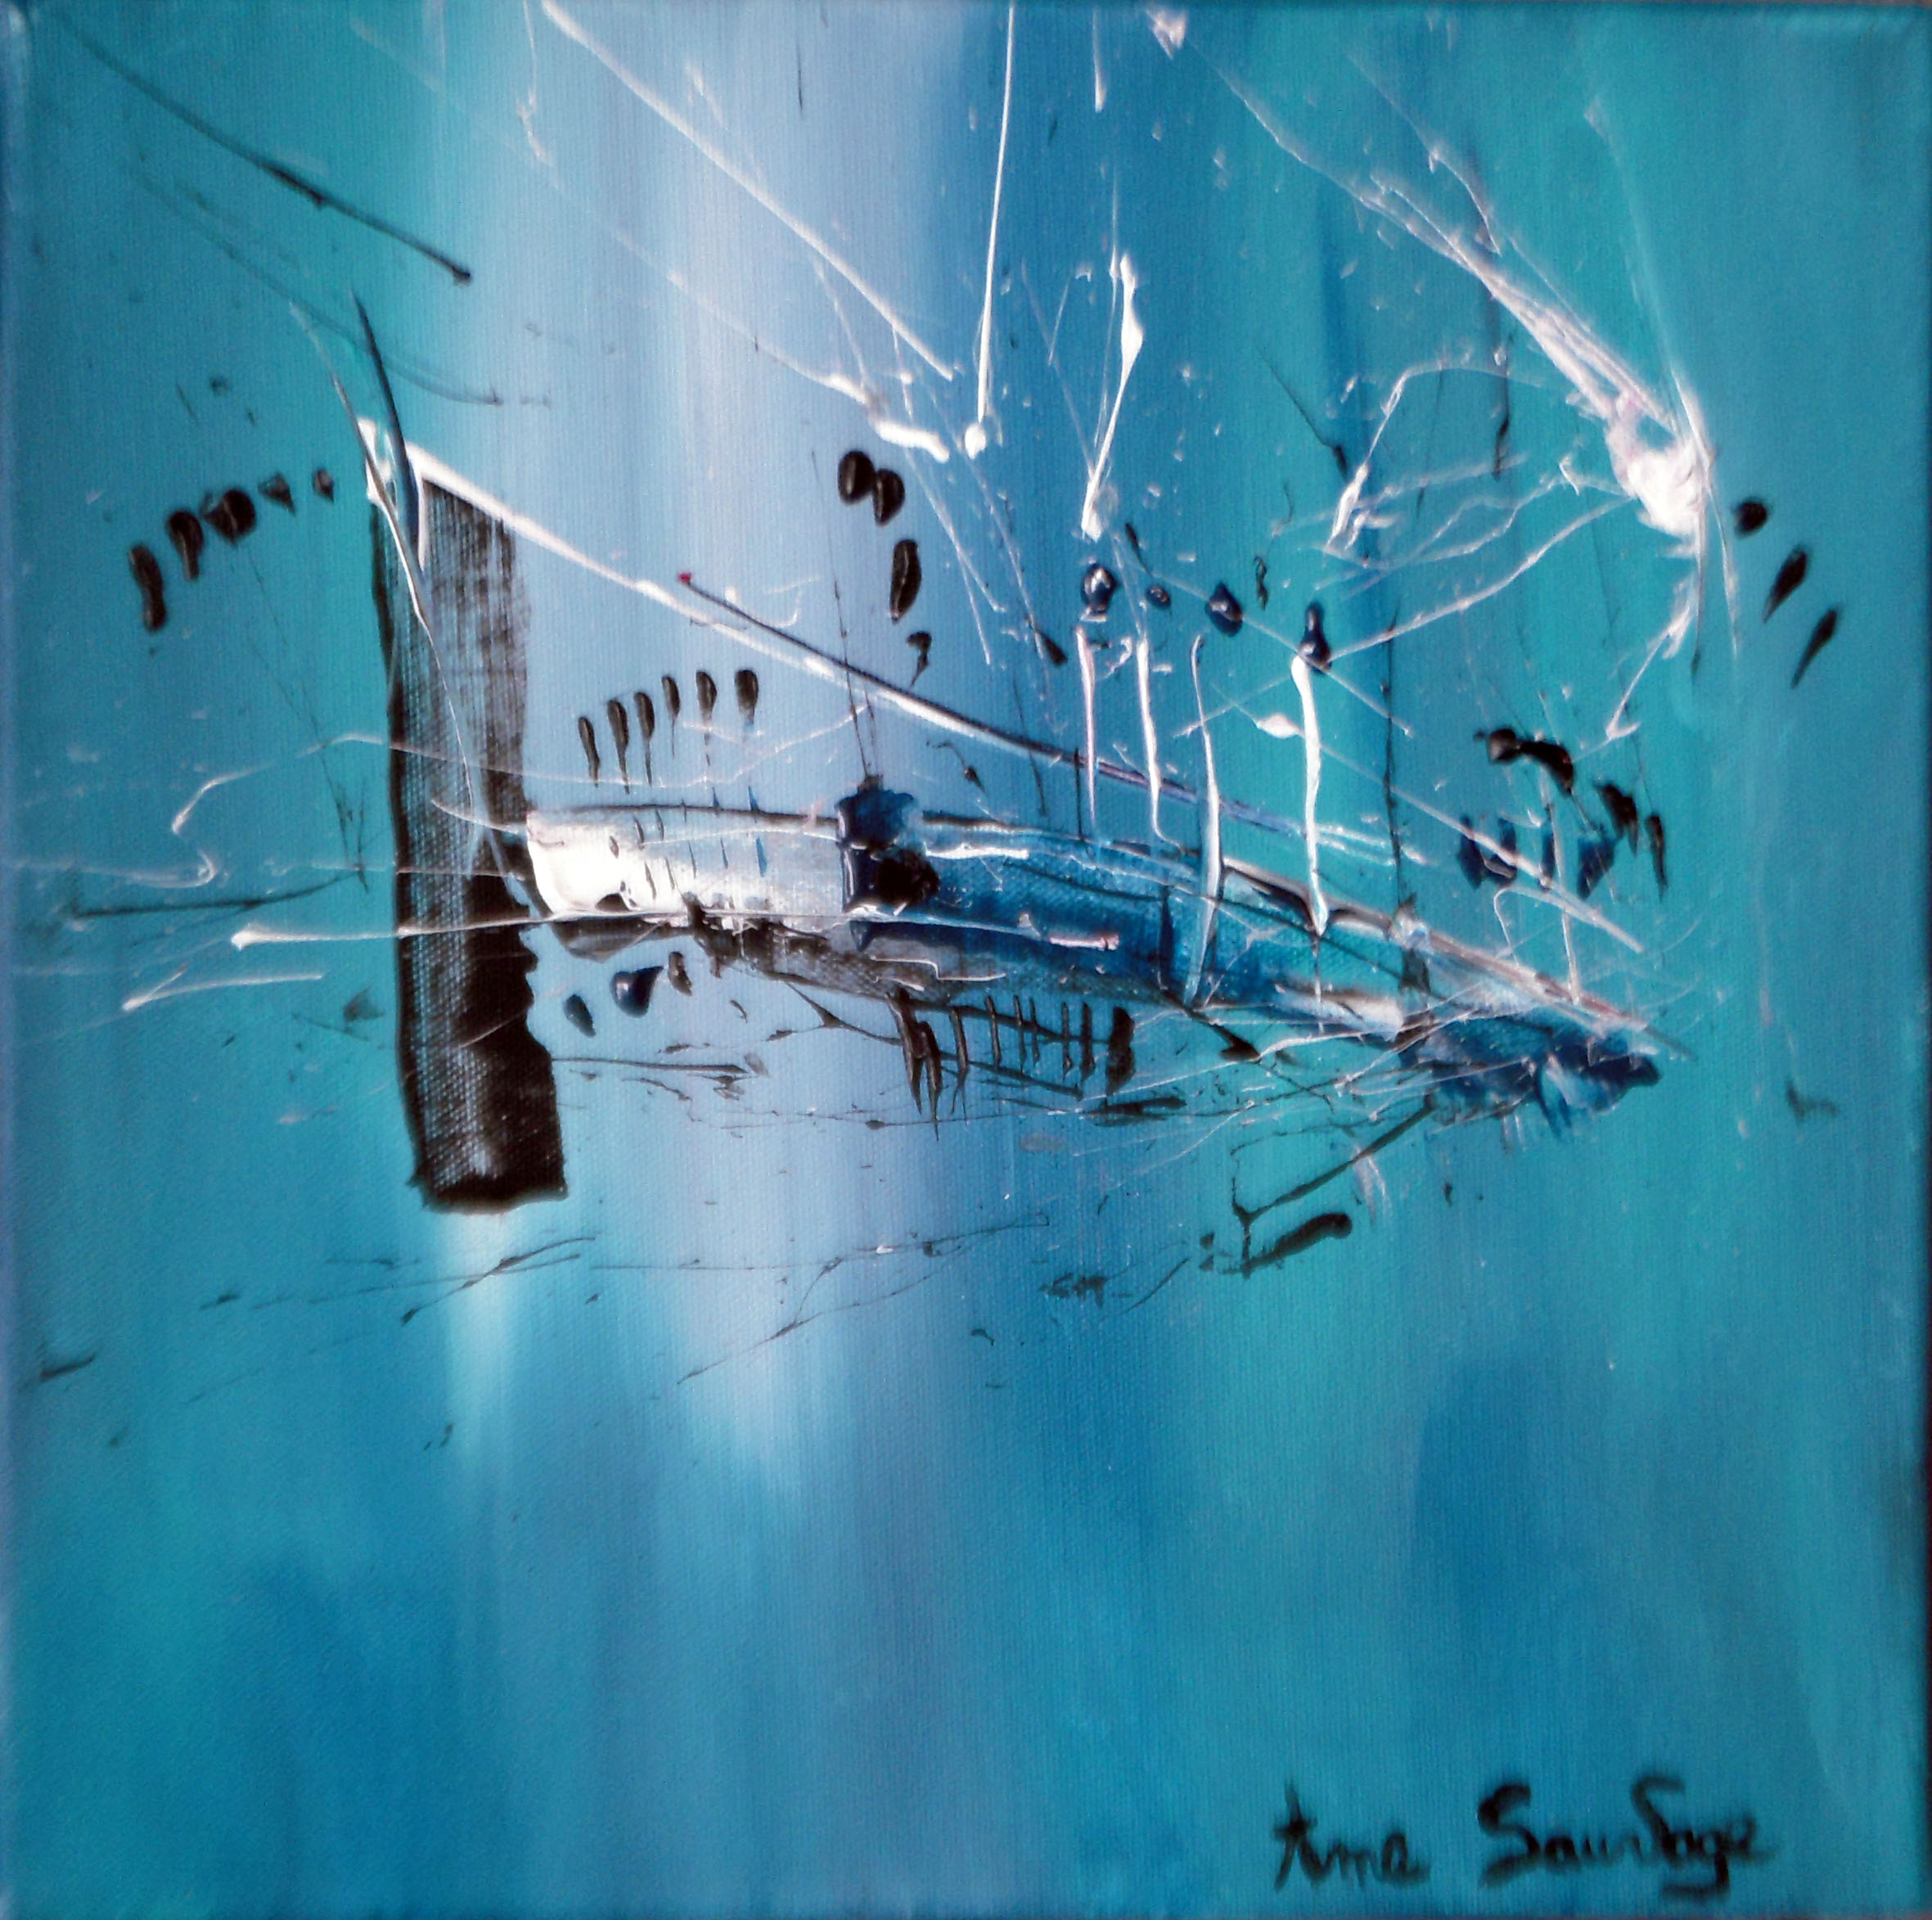 Peinture abstraite moderne design bleu turquoise  Artiste peintre Ame Sauvage